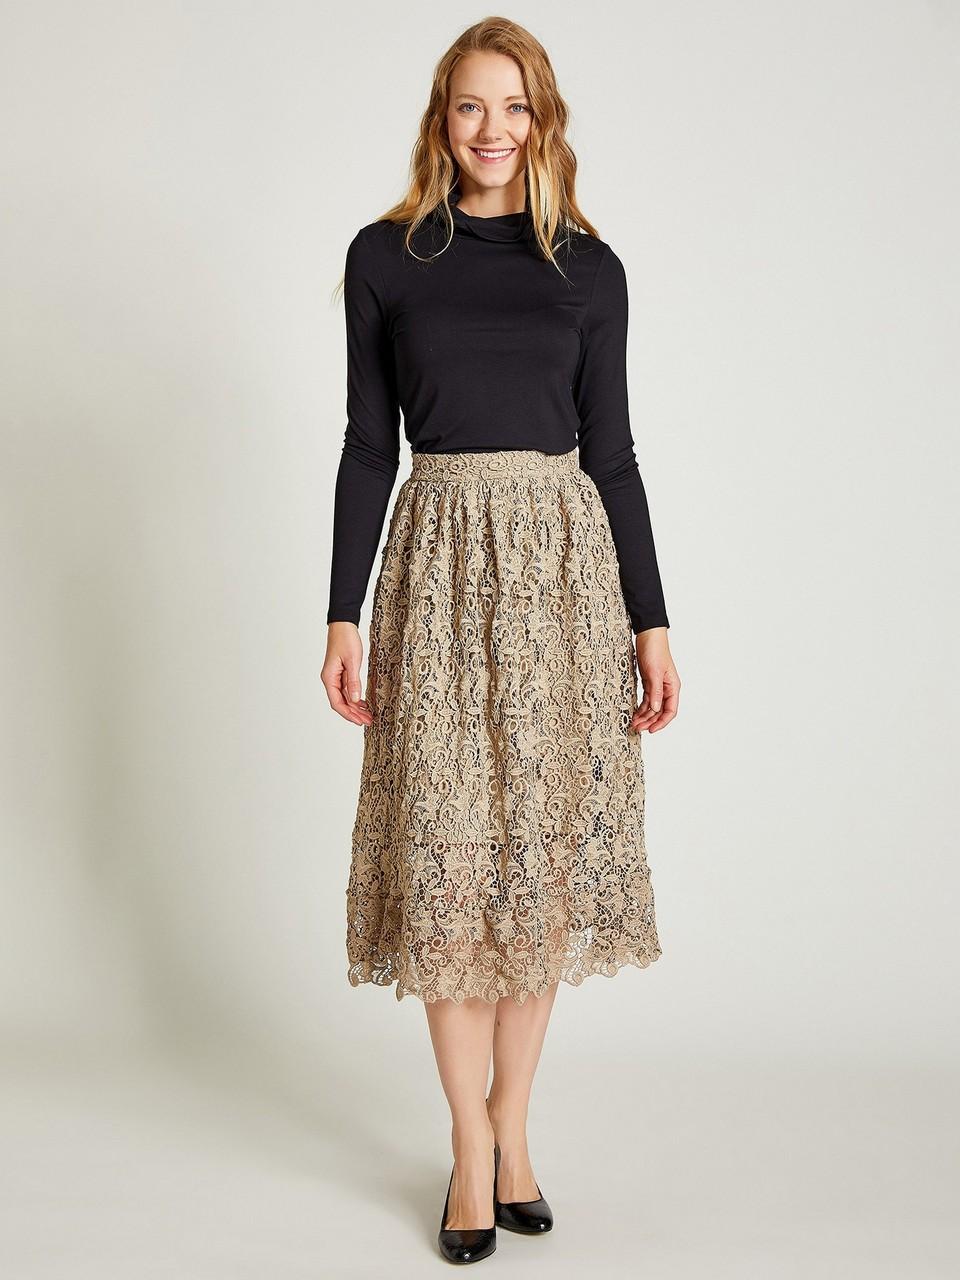 Lacy Bell Shape Skirt